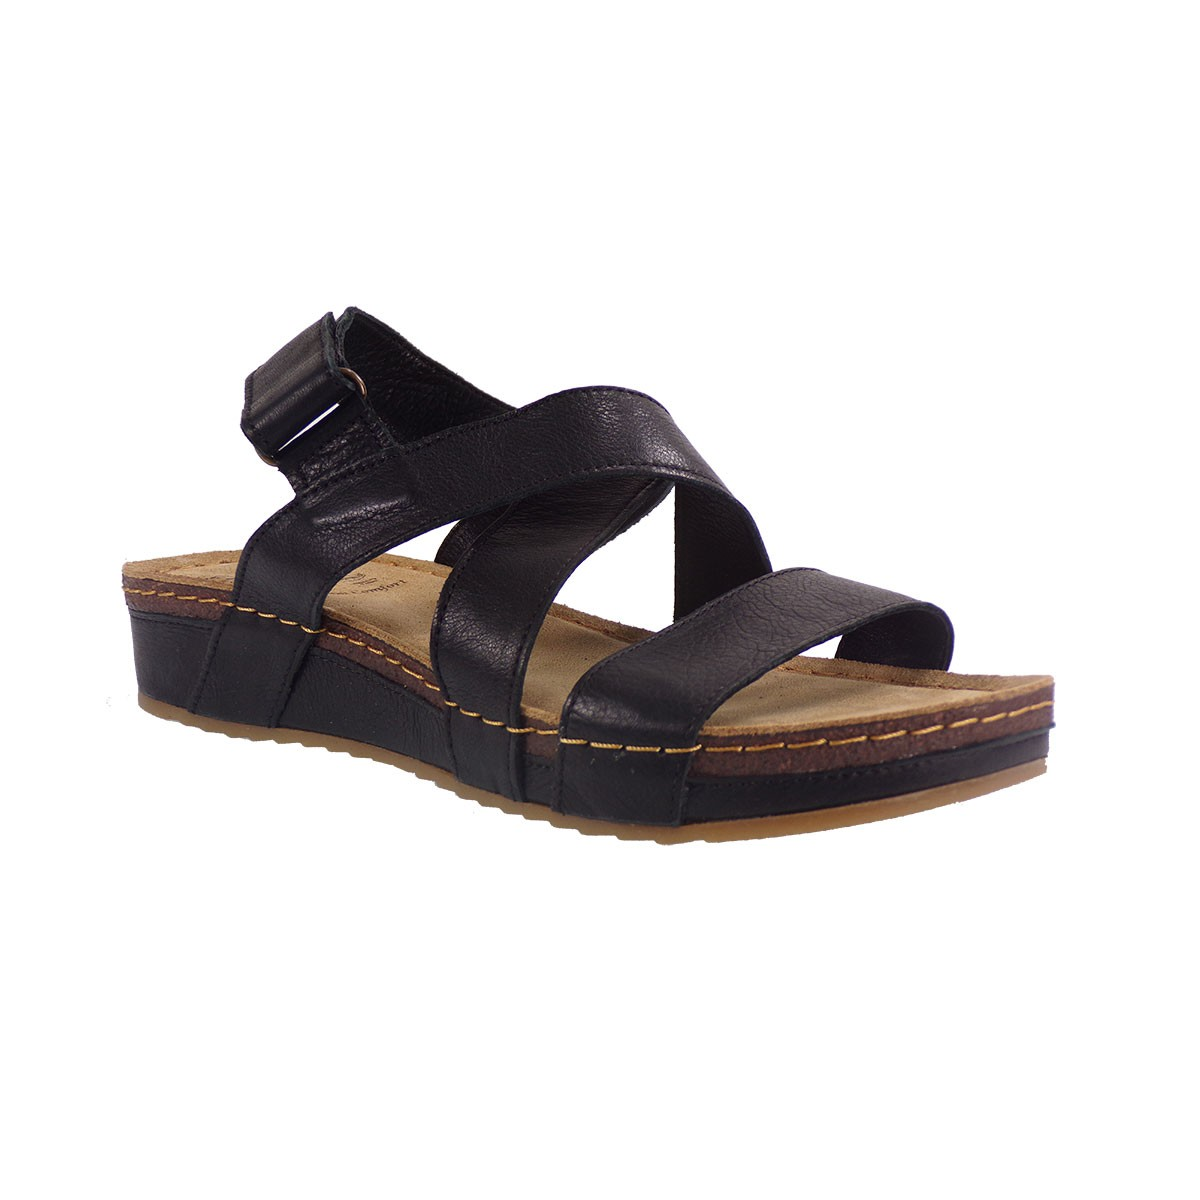 SEKADA Γυναικεία Παπούτσια Πέδιλα 81126-2438 Μαύρο Δέρμα 412566 ... 5f82dcb8901